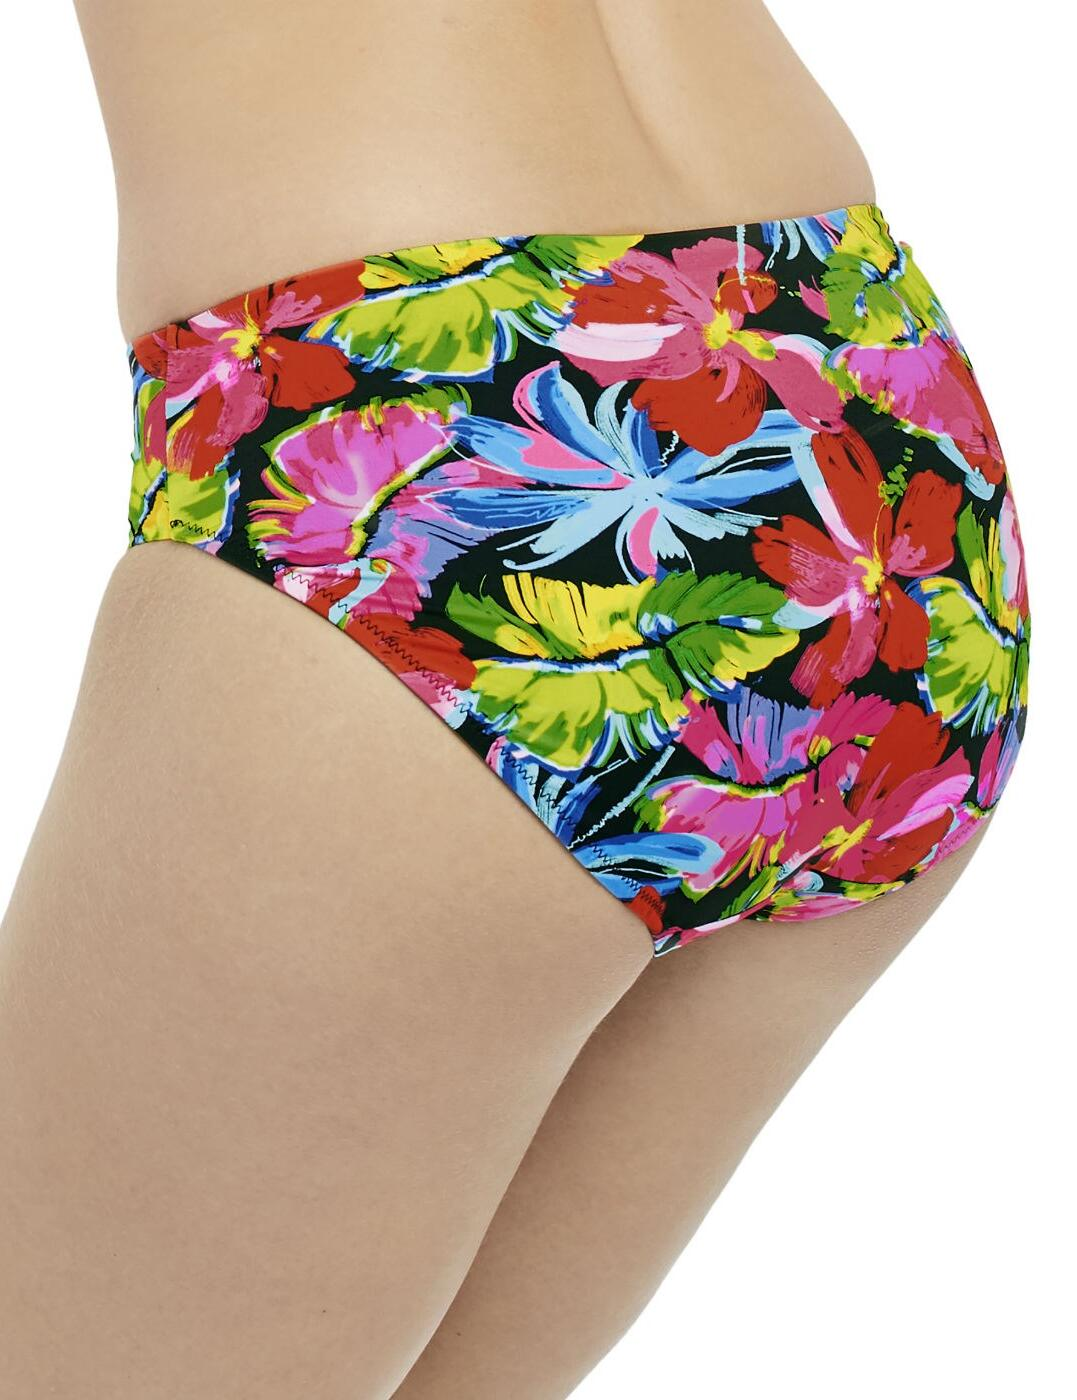 6470 Fantasie Santa Barbara Mid Rise Bikini Brief